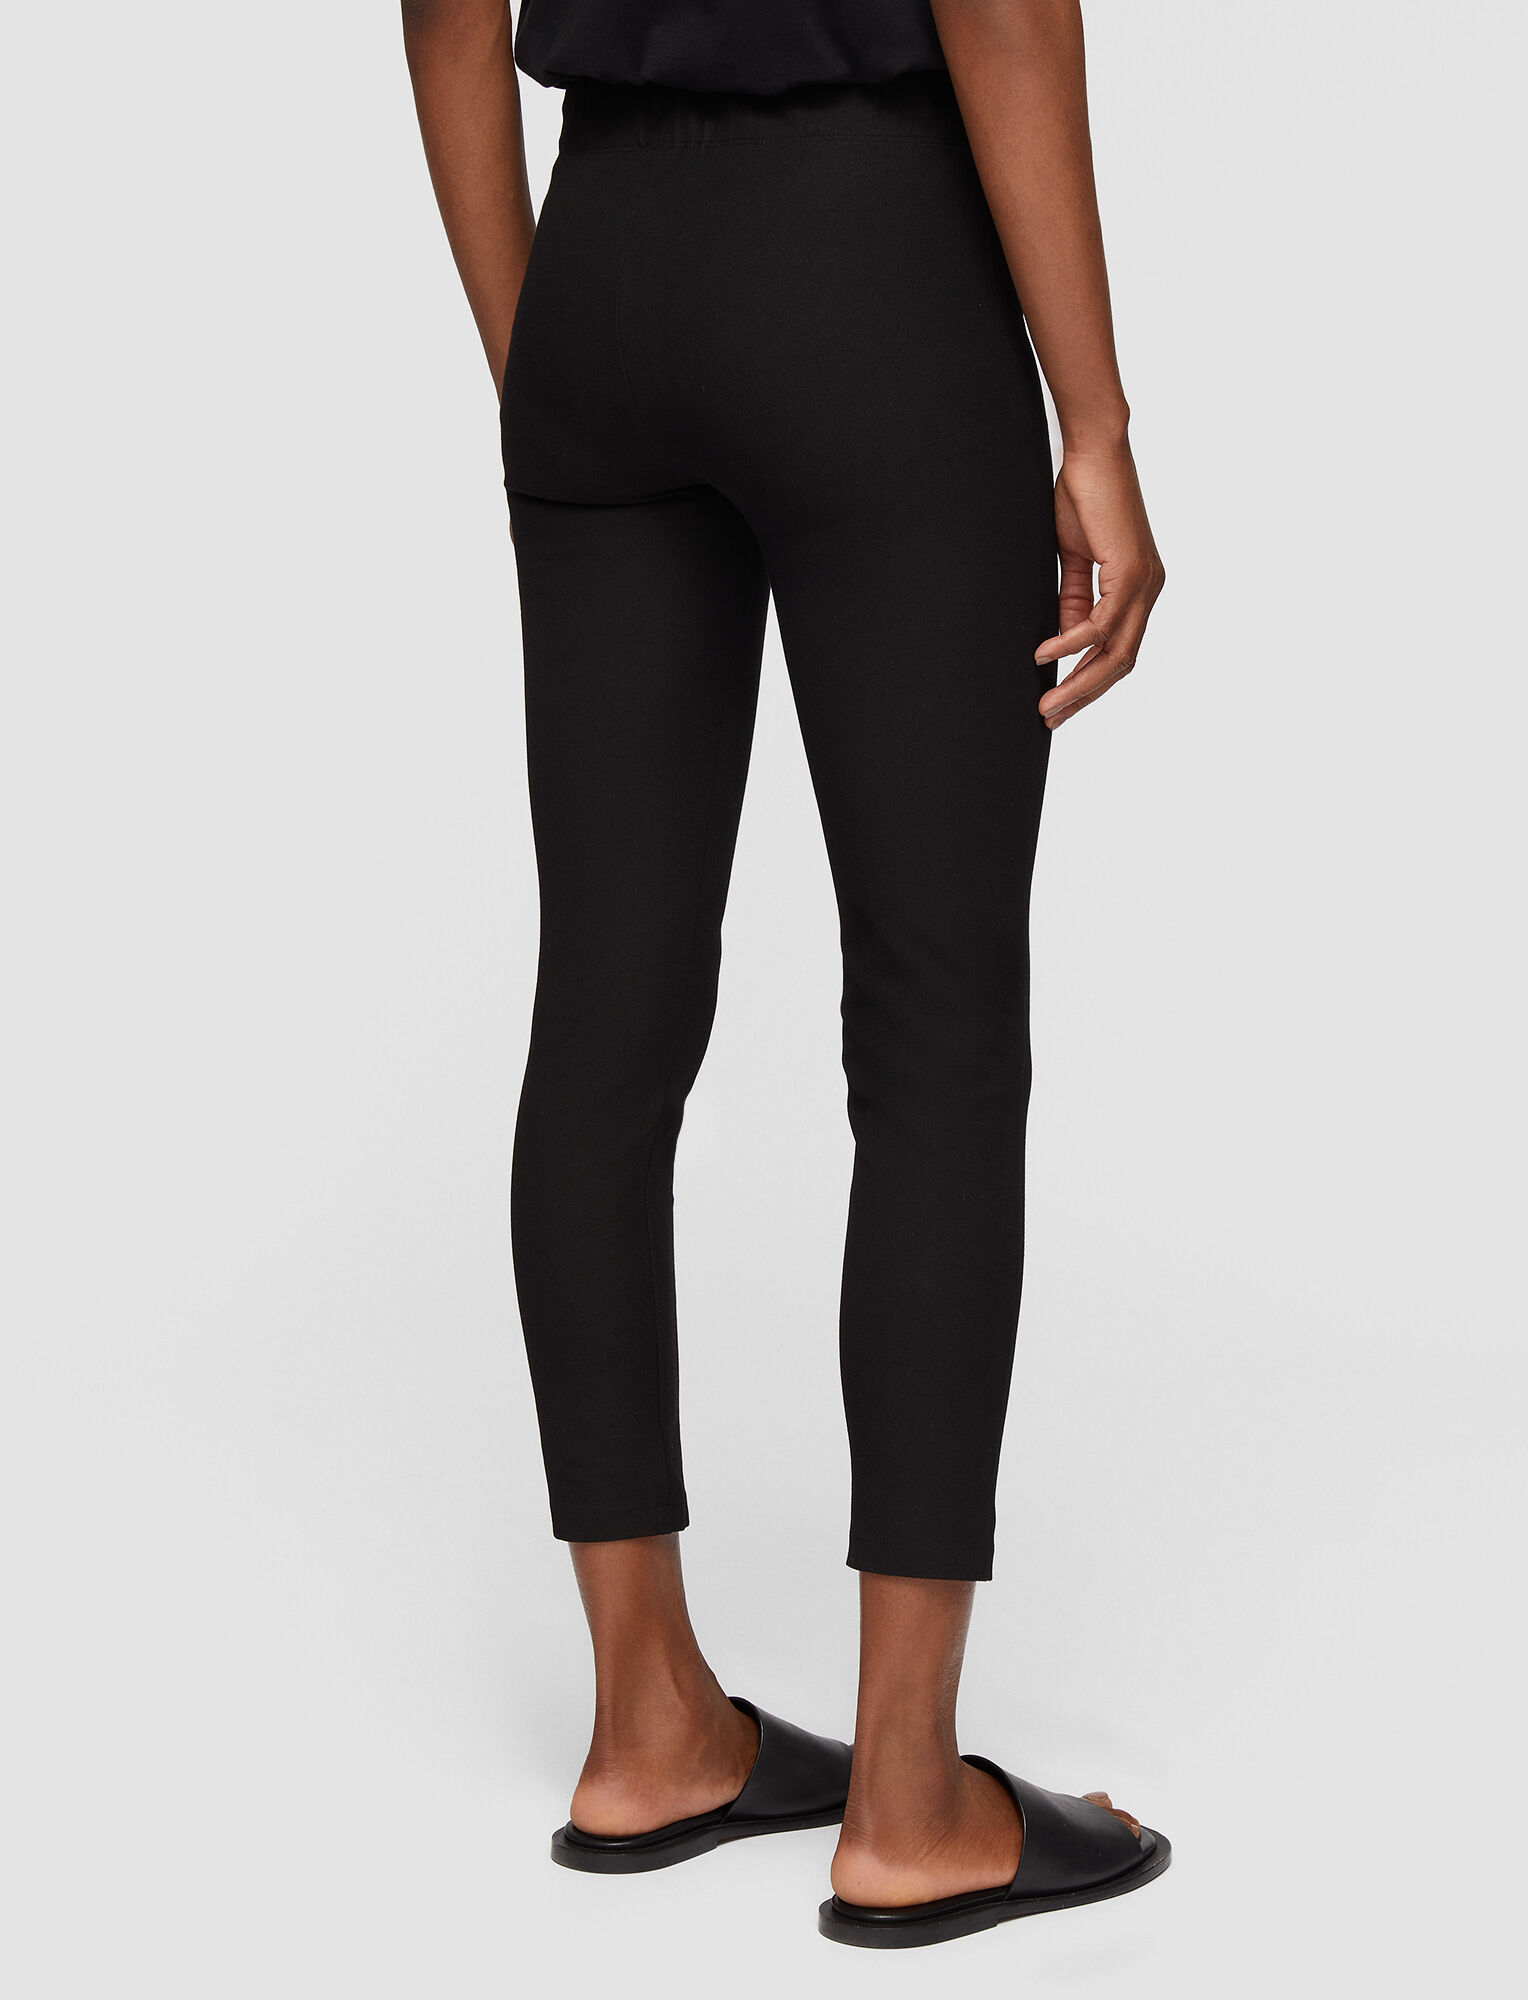 Joseph, Nitro Gabardine Stretch Trousers, in BLACK